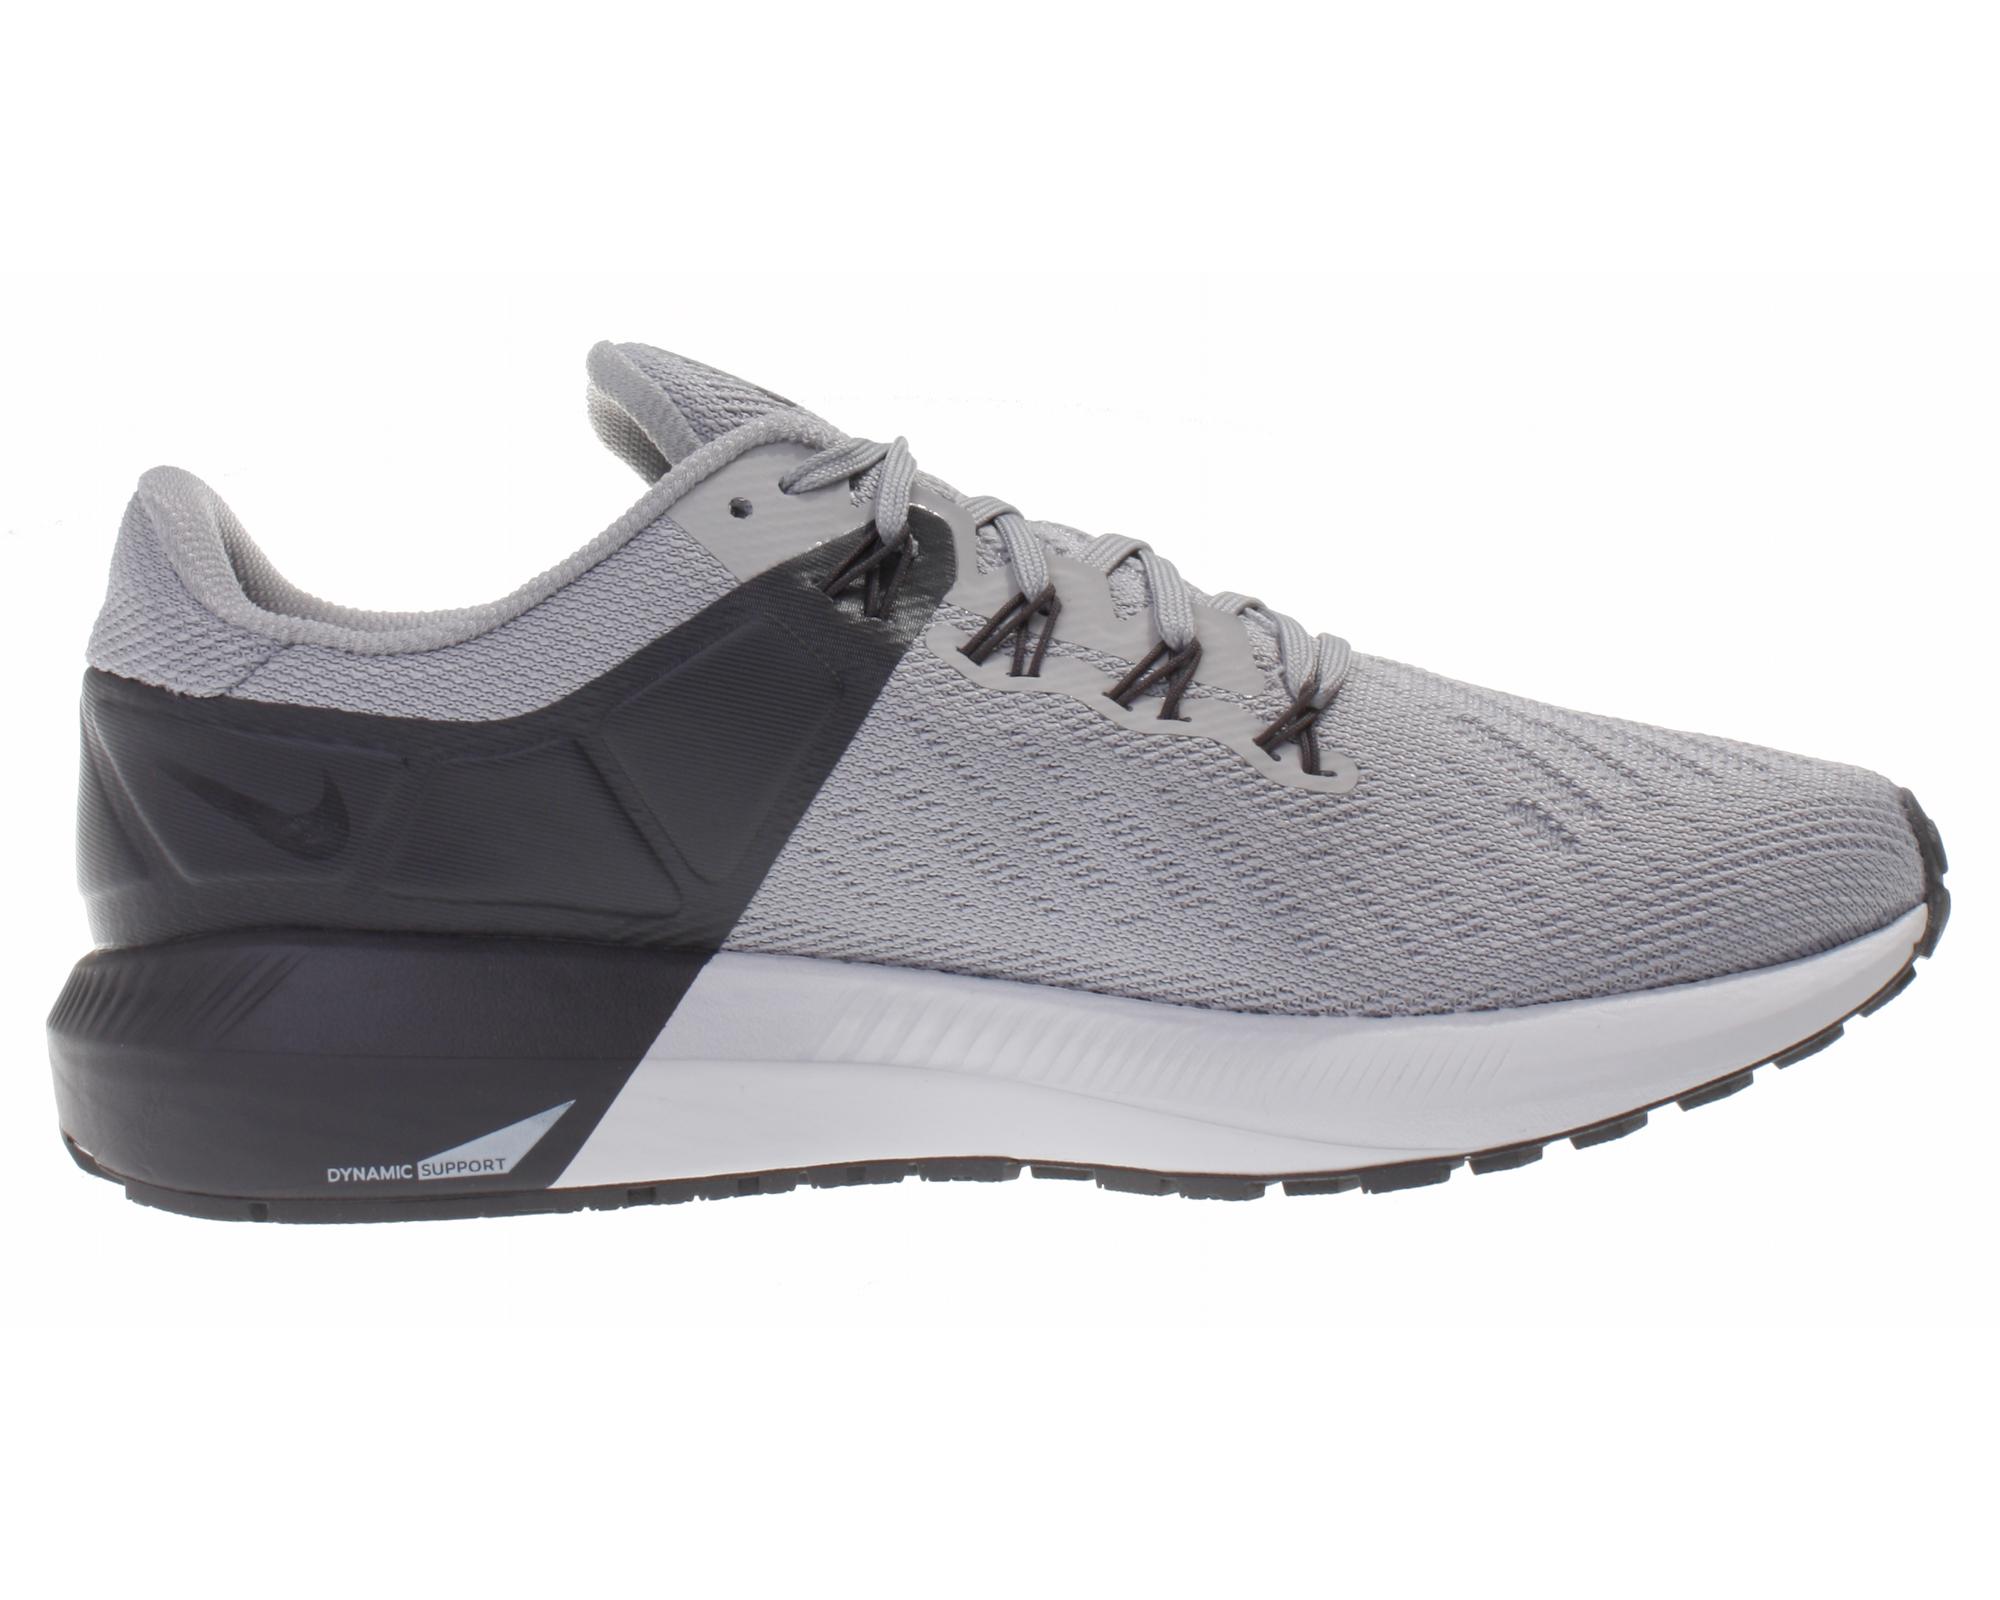 Details zu Nike Herren Freizeit Schuhe Air Zoom Structure Schuhe 22 Low Top Sneaker grau